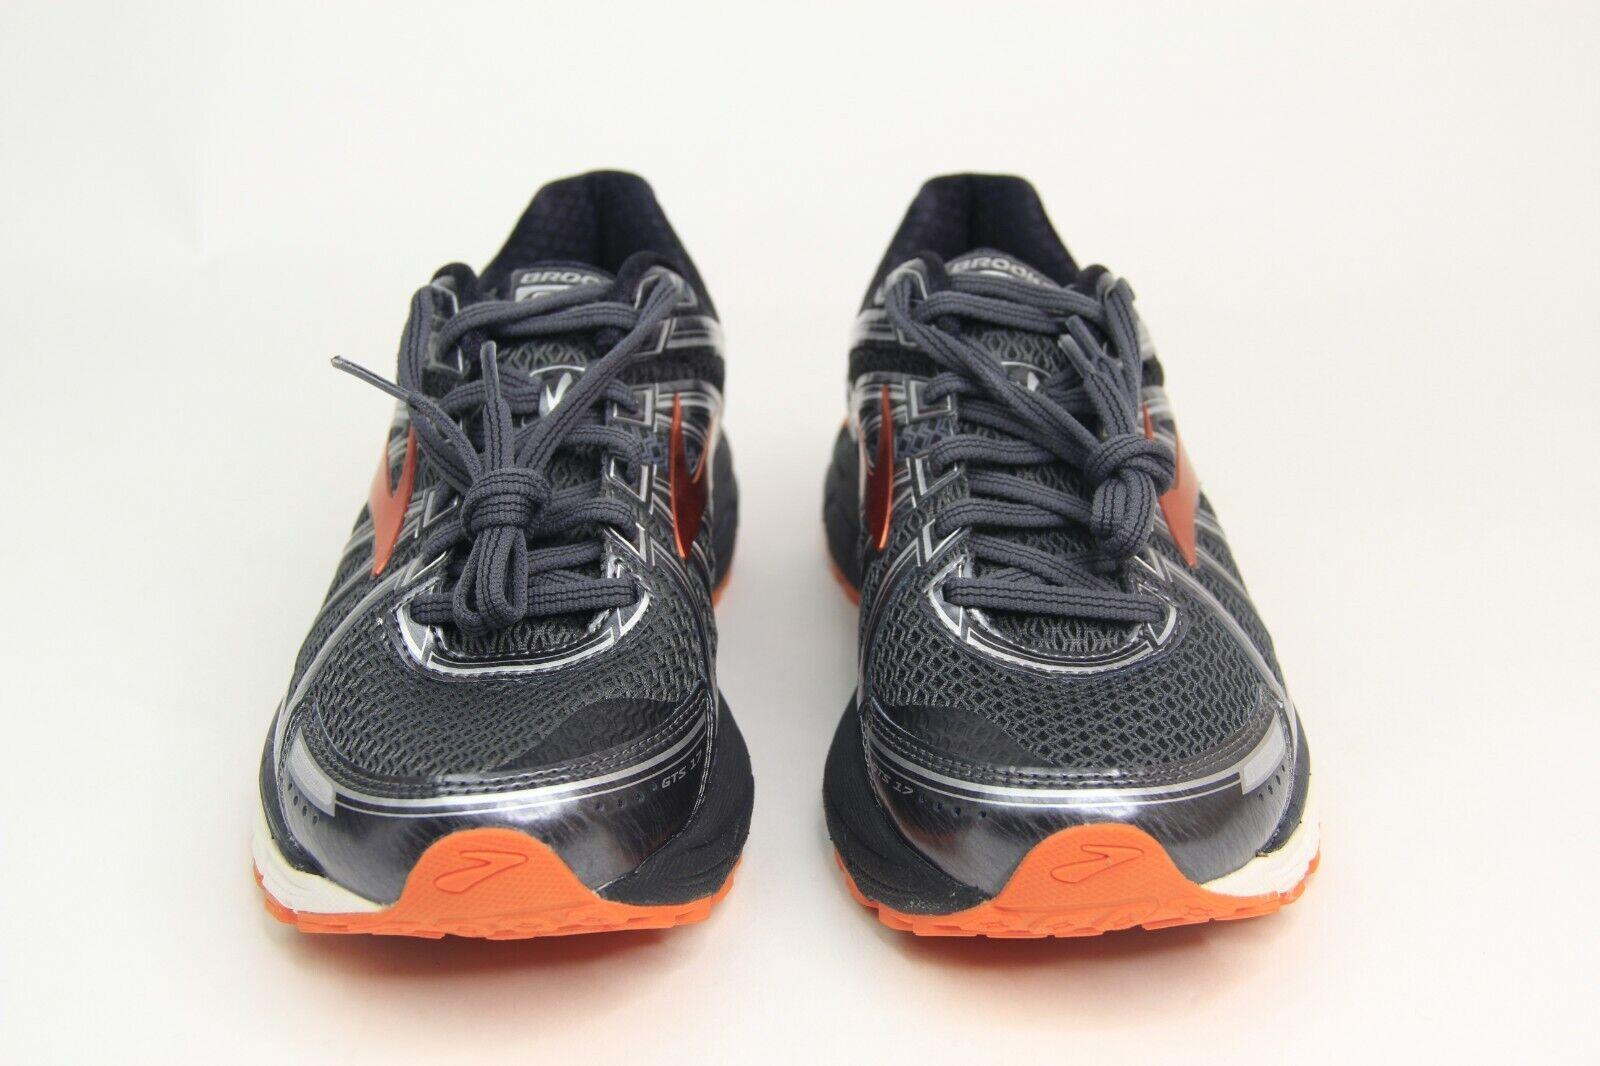 Brooks para Hombre GTS 17 Negro Plata Naranja Running Zapatos 1102411D024 Talla M 8.5 W 10